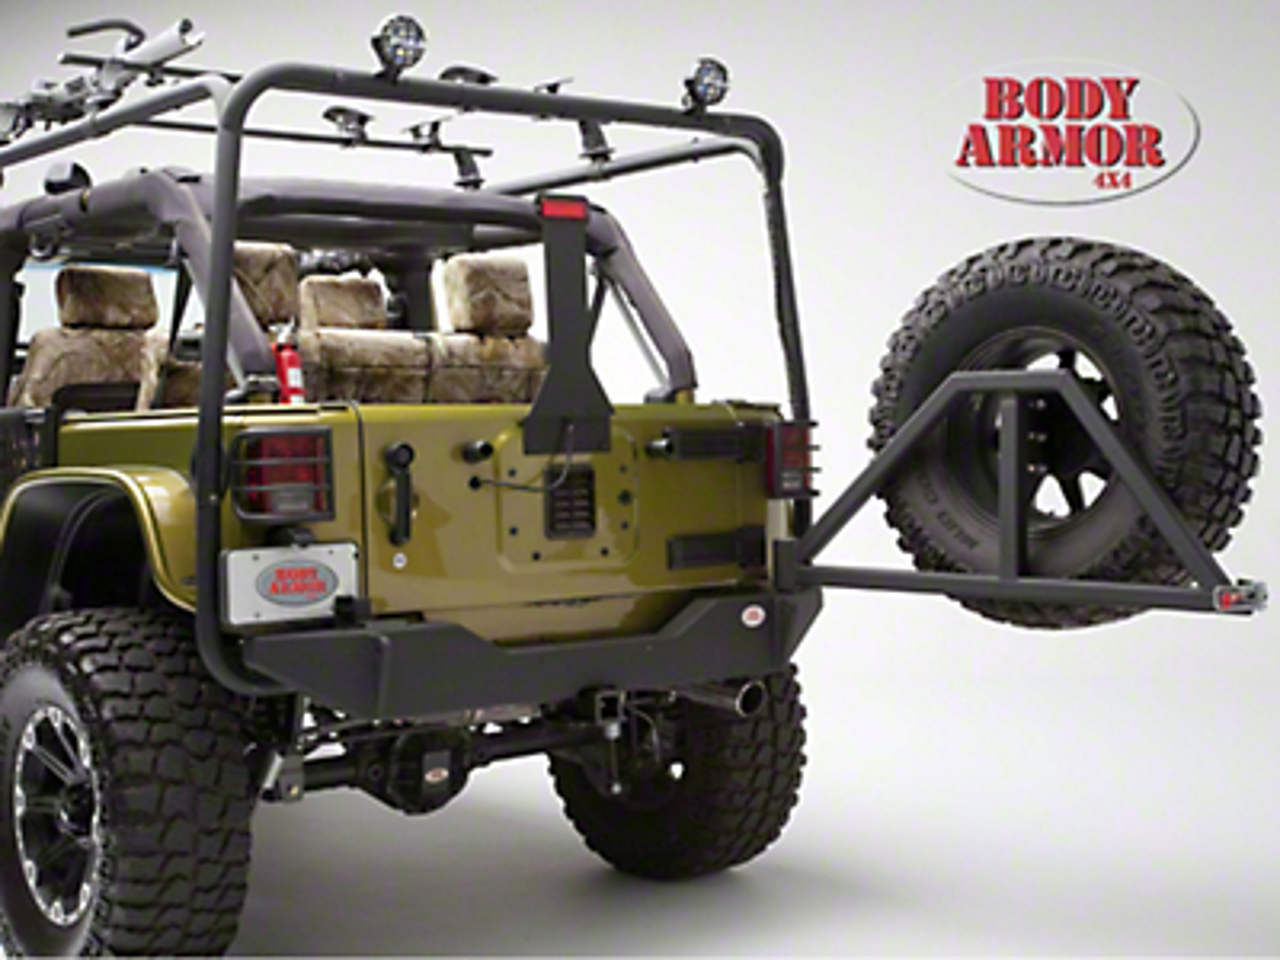 Body Armor 4x4 Rear Bumper (07-17 Wrangler JK)